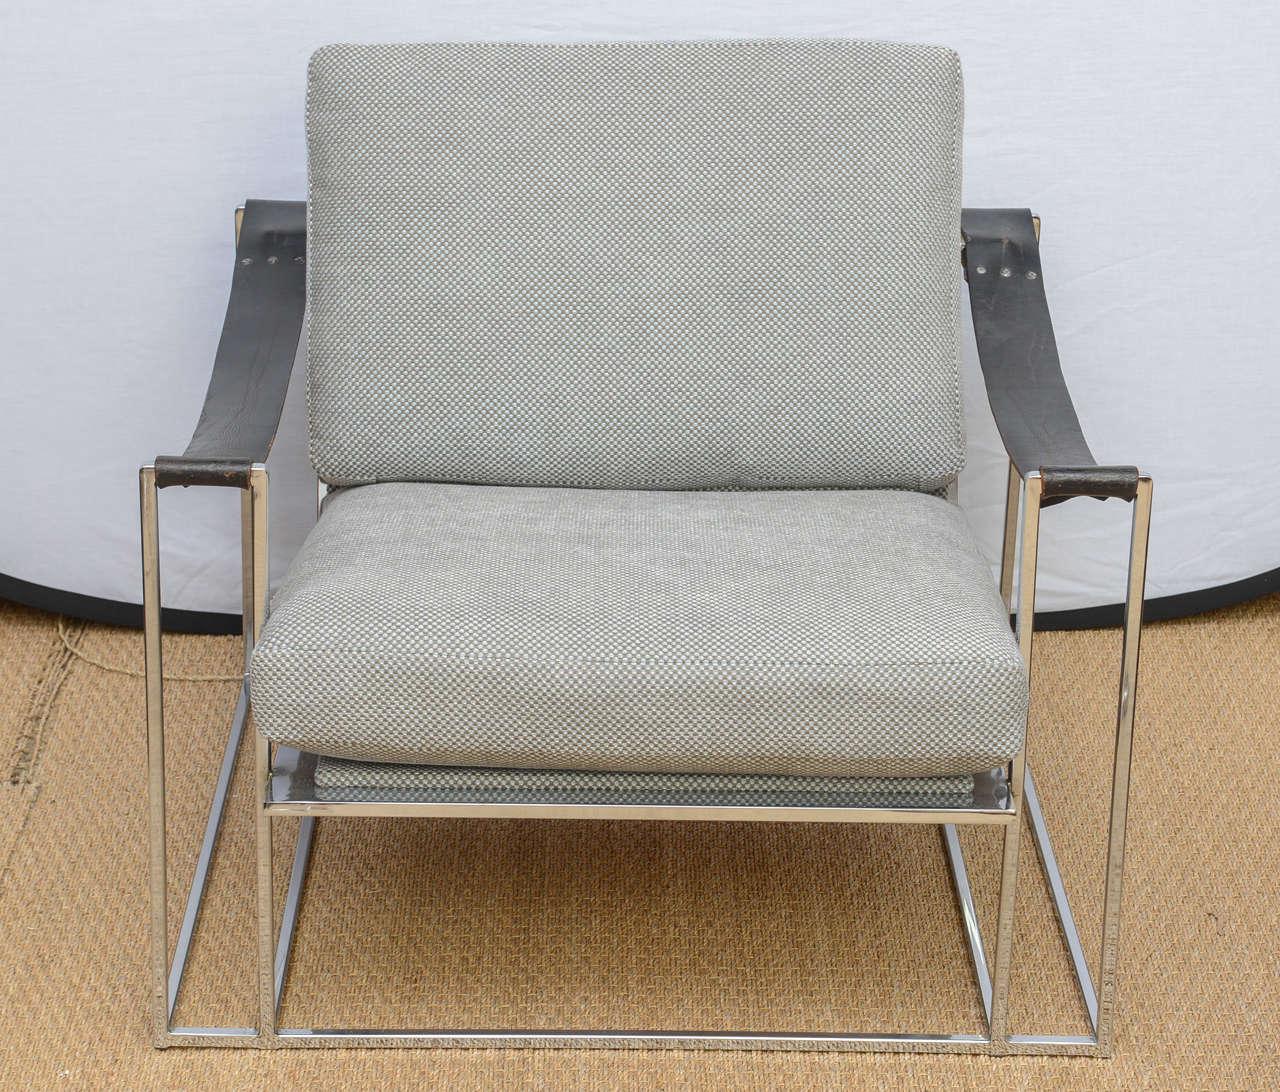 Milo Baughman Floating Lounge Chair Pair circa 1972 at 1stdibs